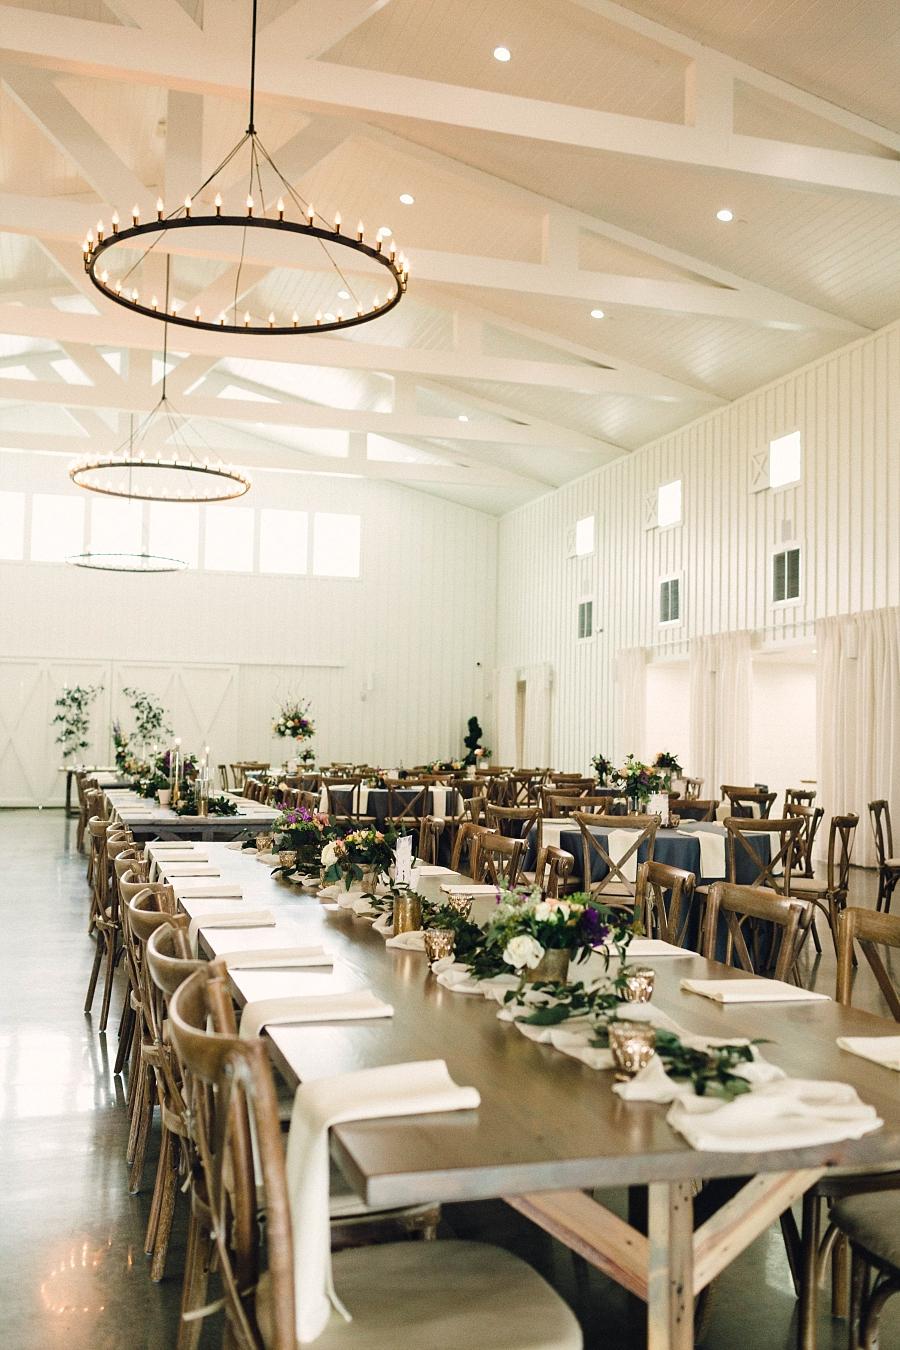 Stacy-Anderson-Photography-The-Farmhouse-Houston-Wedding-Photographer_0035.jpg